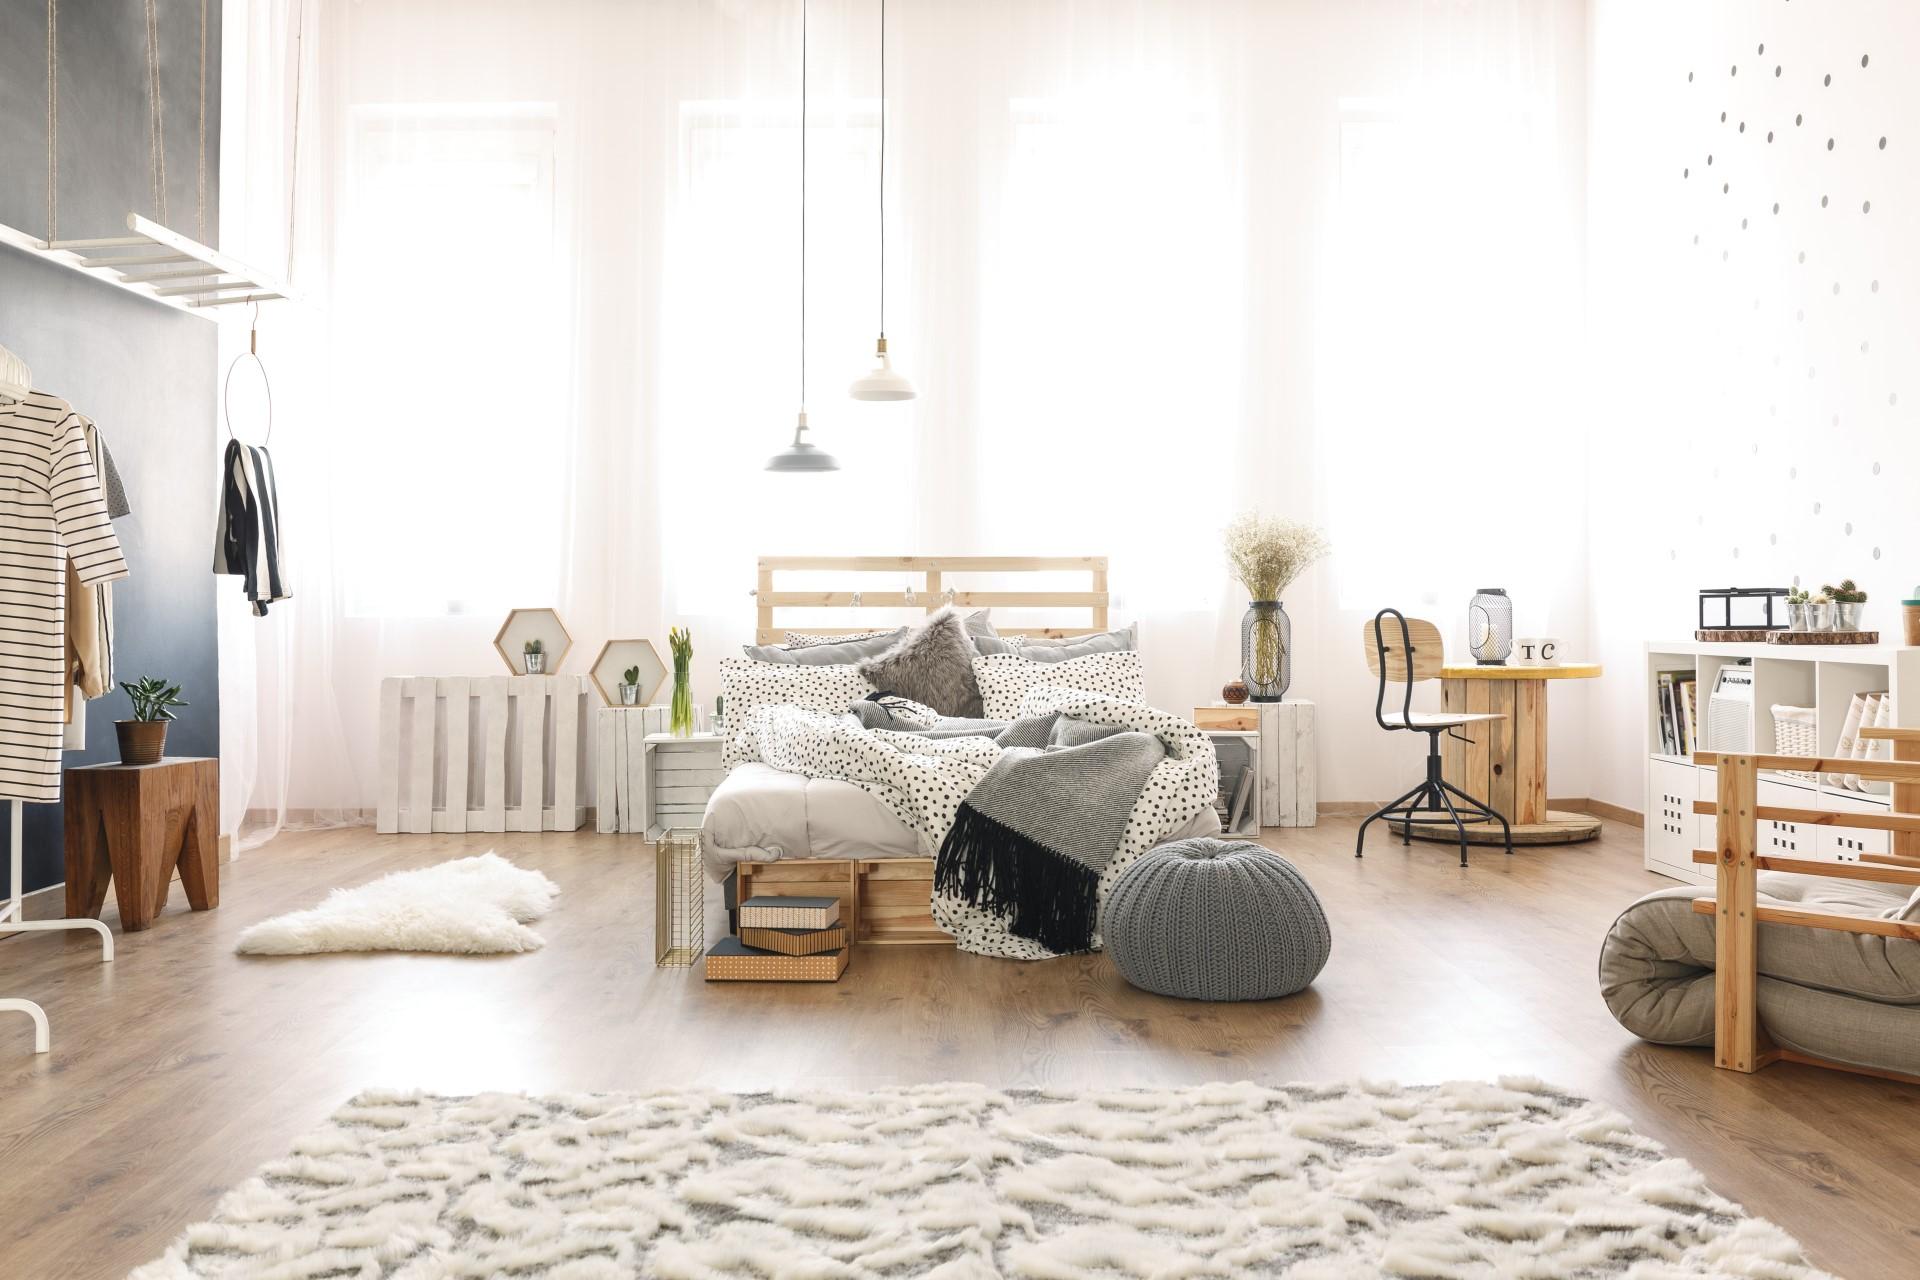 apartment with pallet furniture - Header Top Slider